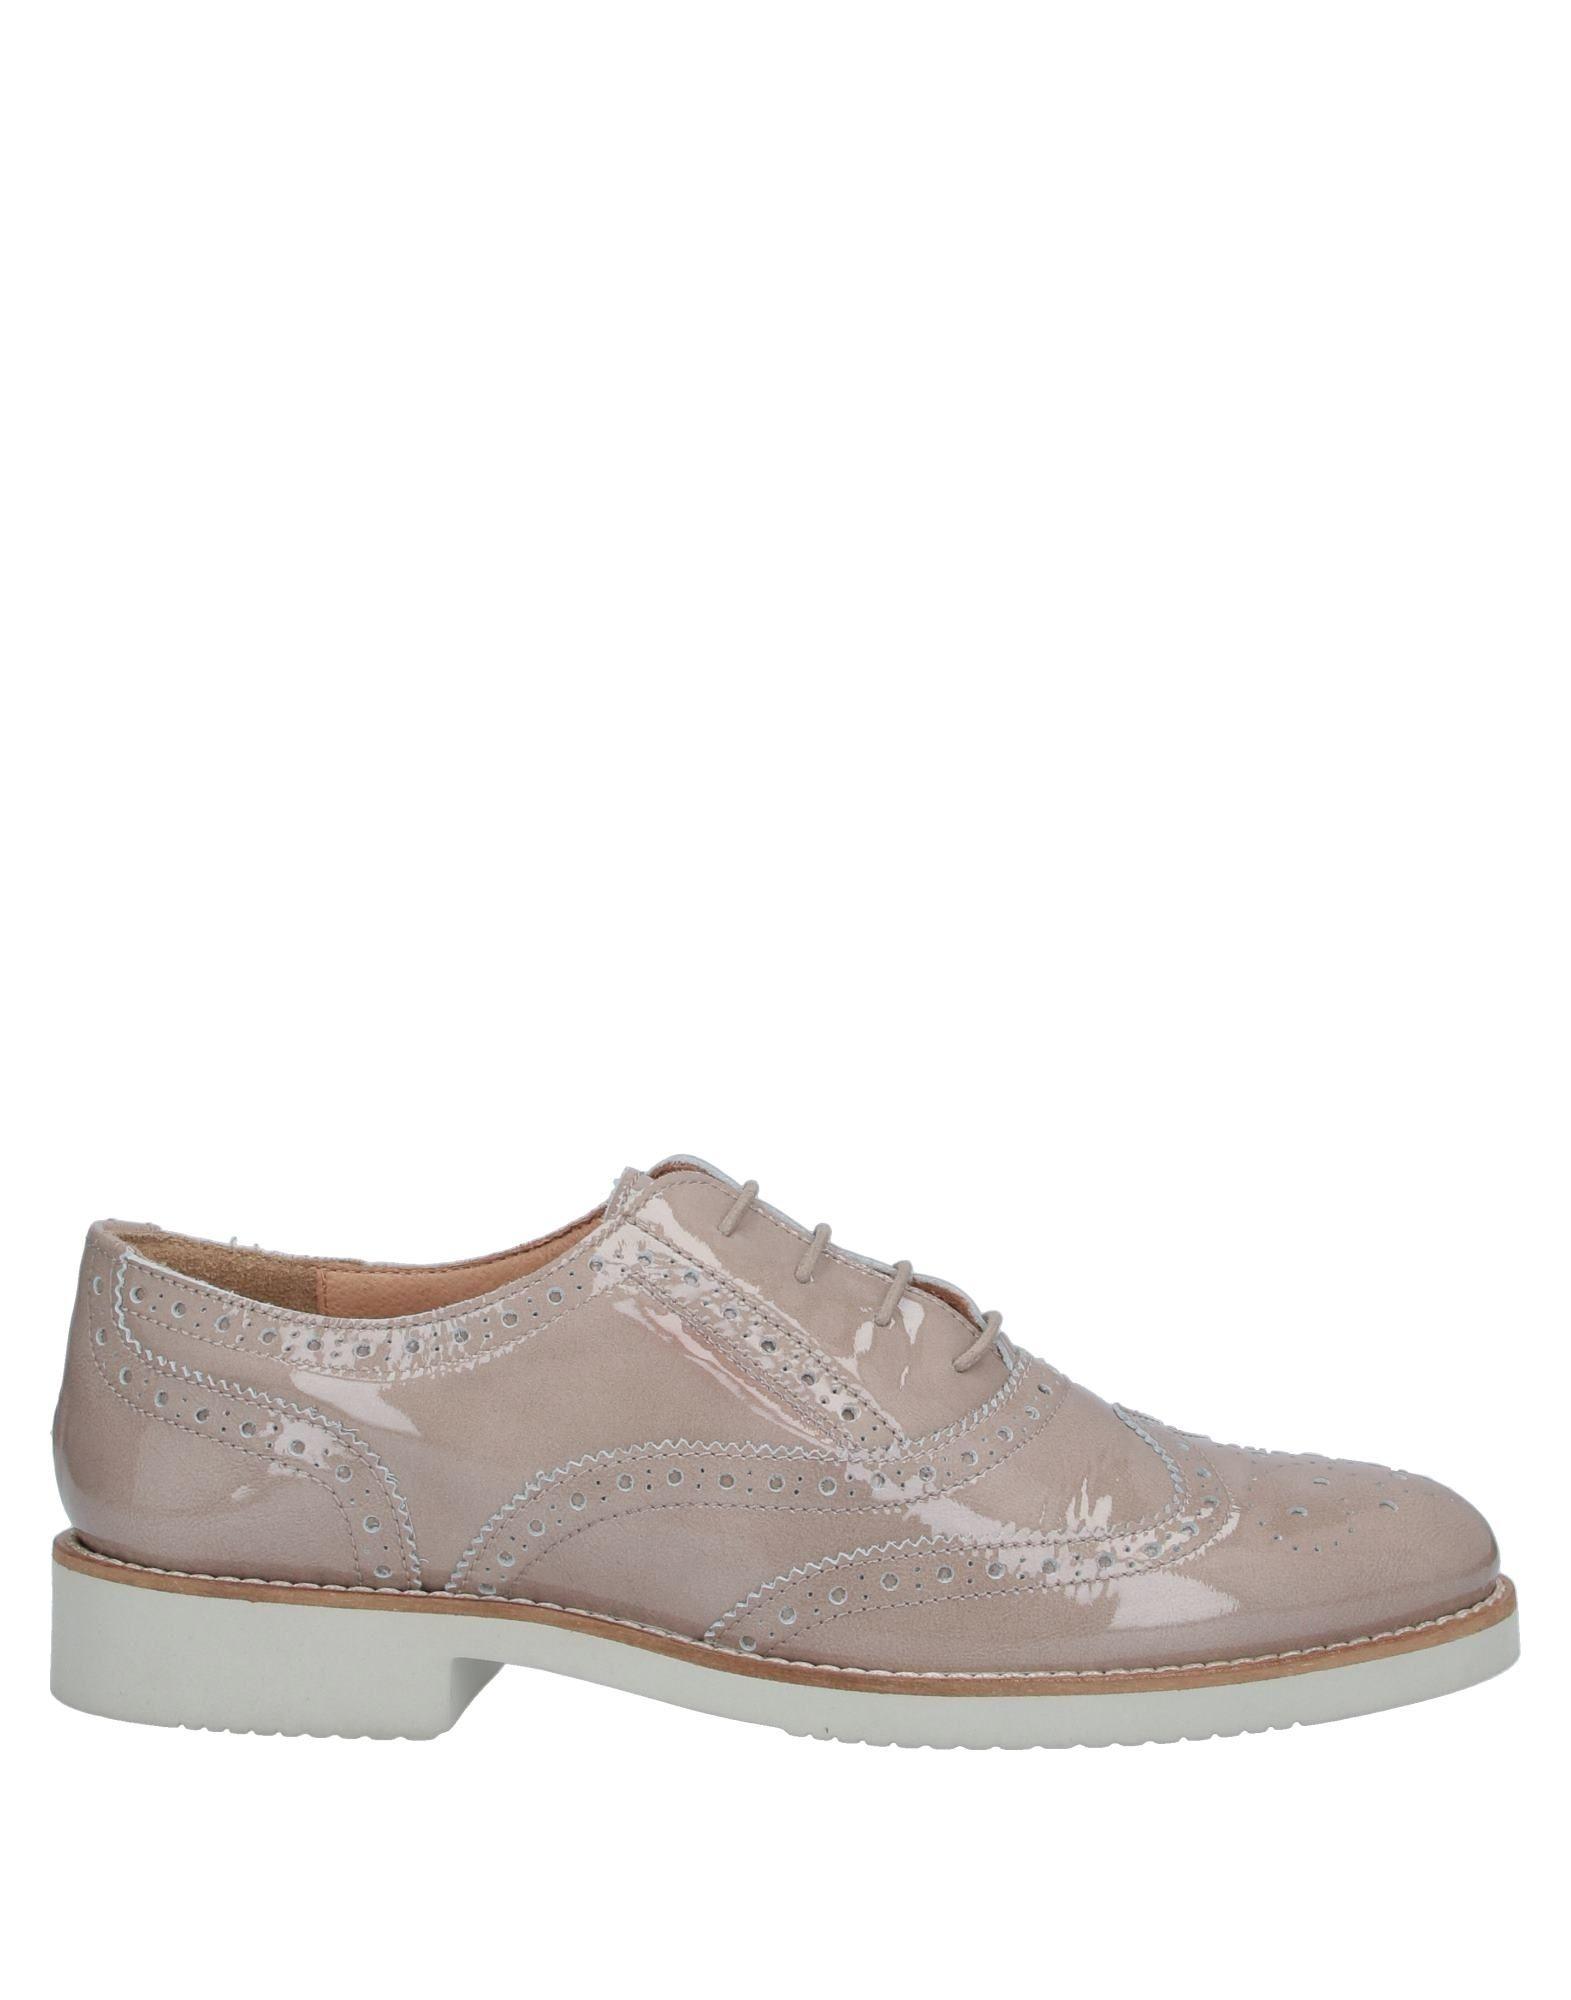 MARITAN G Обувь на шнурках maritan g обувь на шнурках